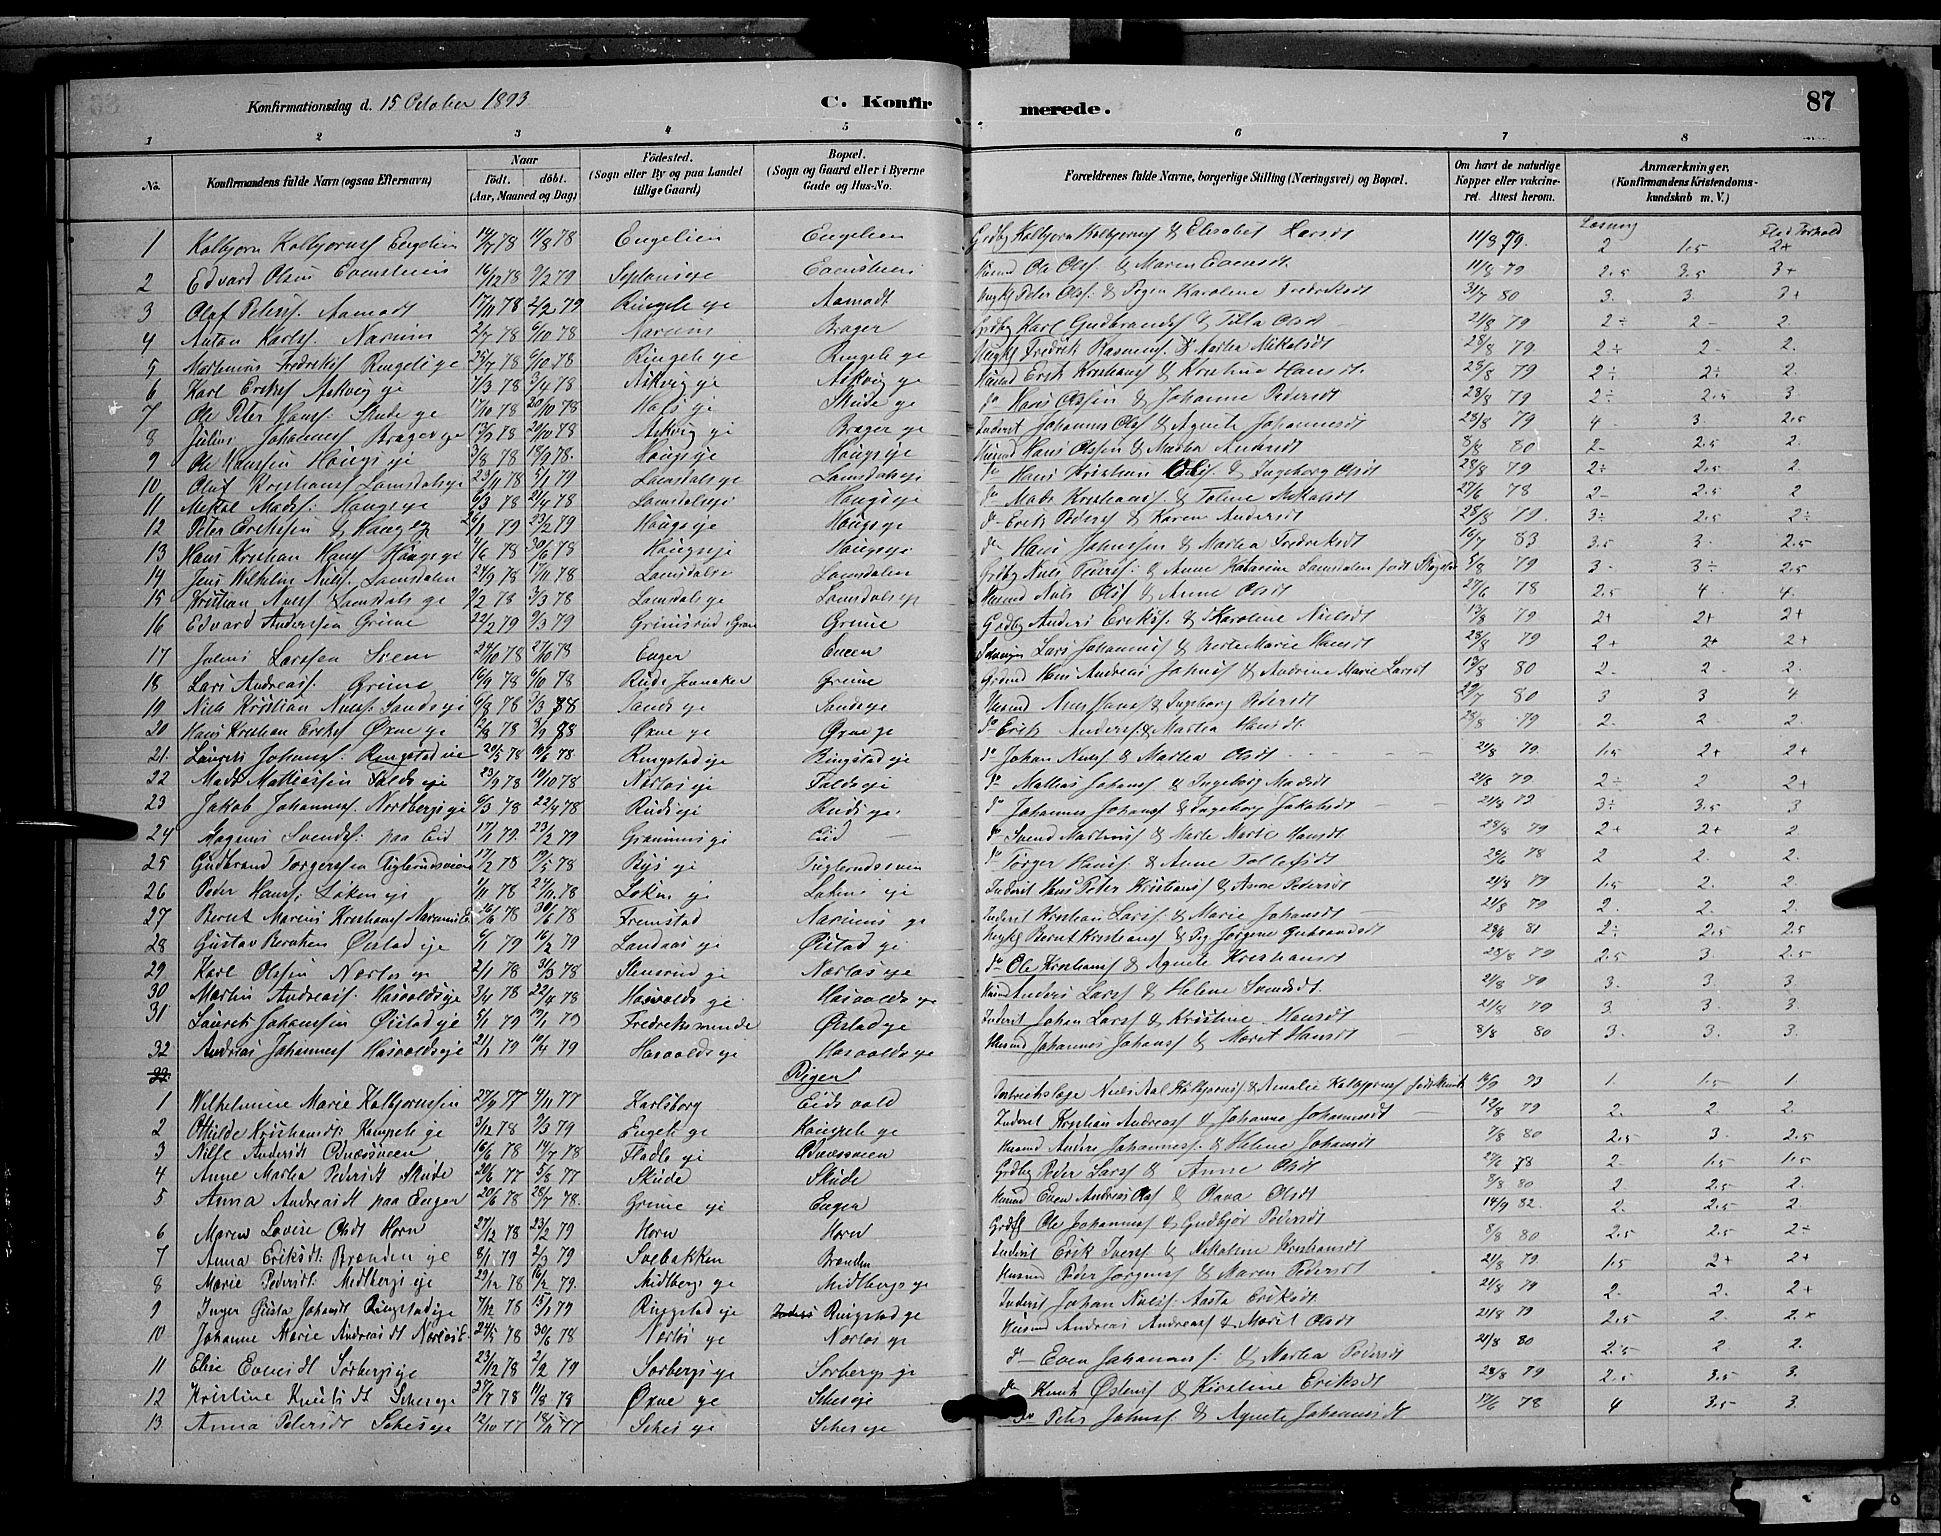 SAH, Søndre Land prestekontor, L/L0002: Klokkerbok nr. 2, 1884-1900, s. 87